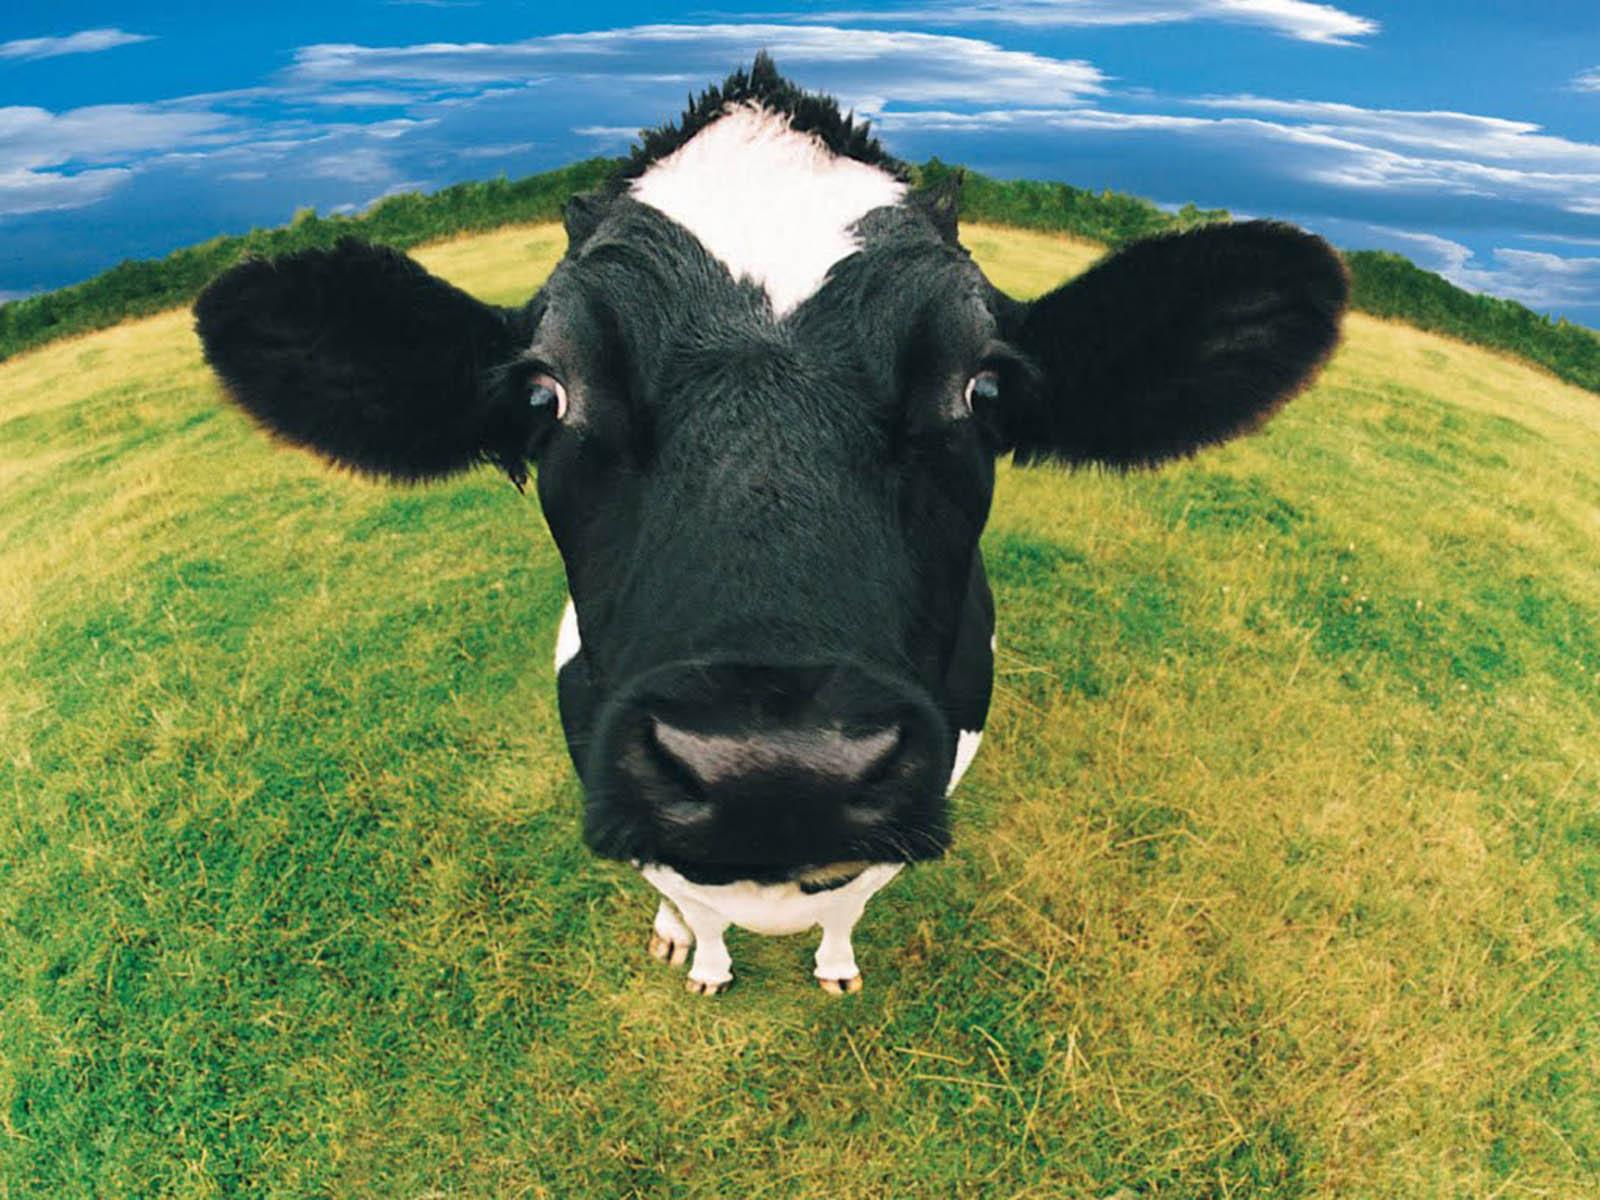 Funny Farm Animals Desktop Wallpaper 1600x1200